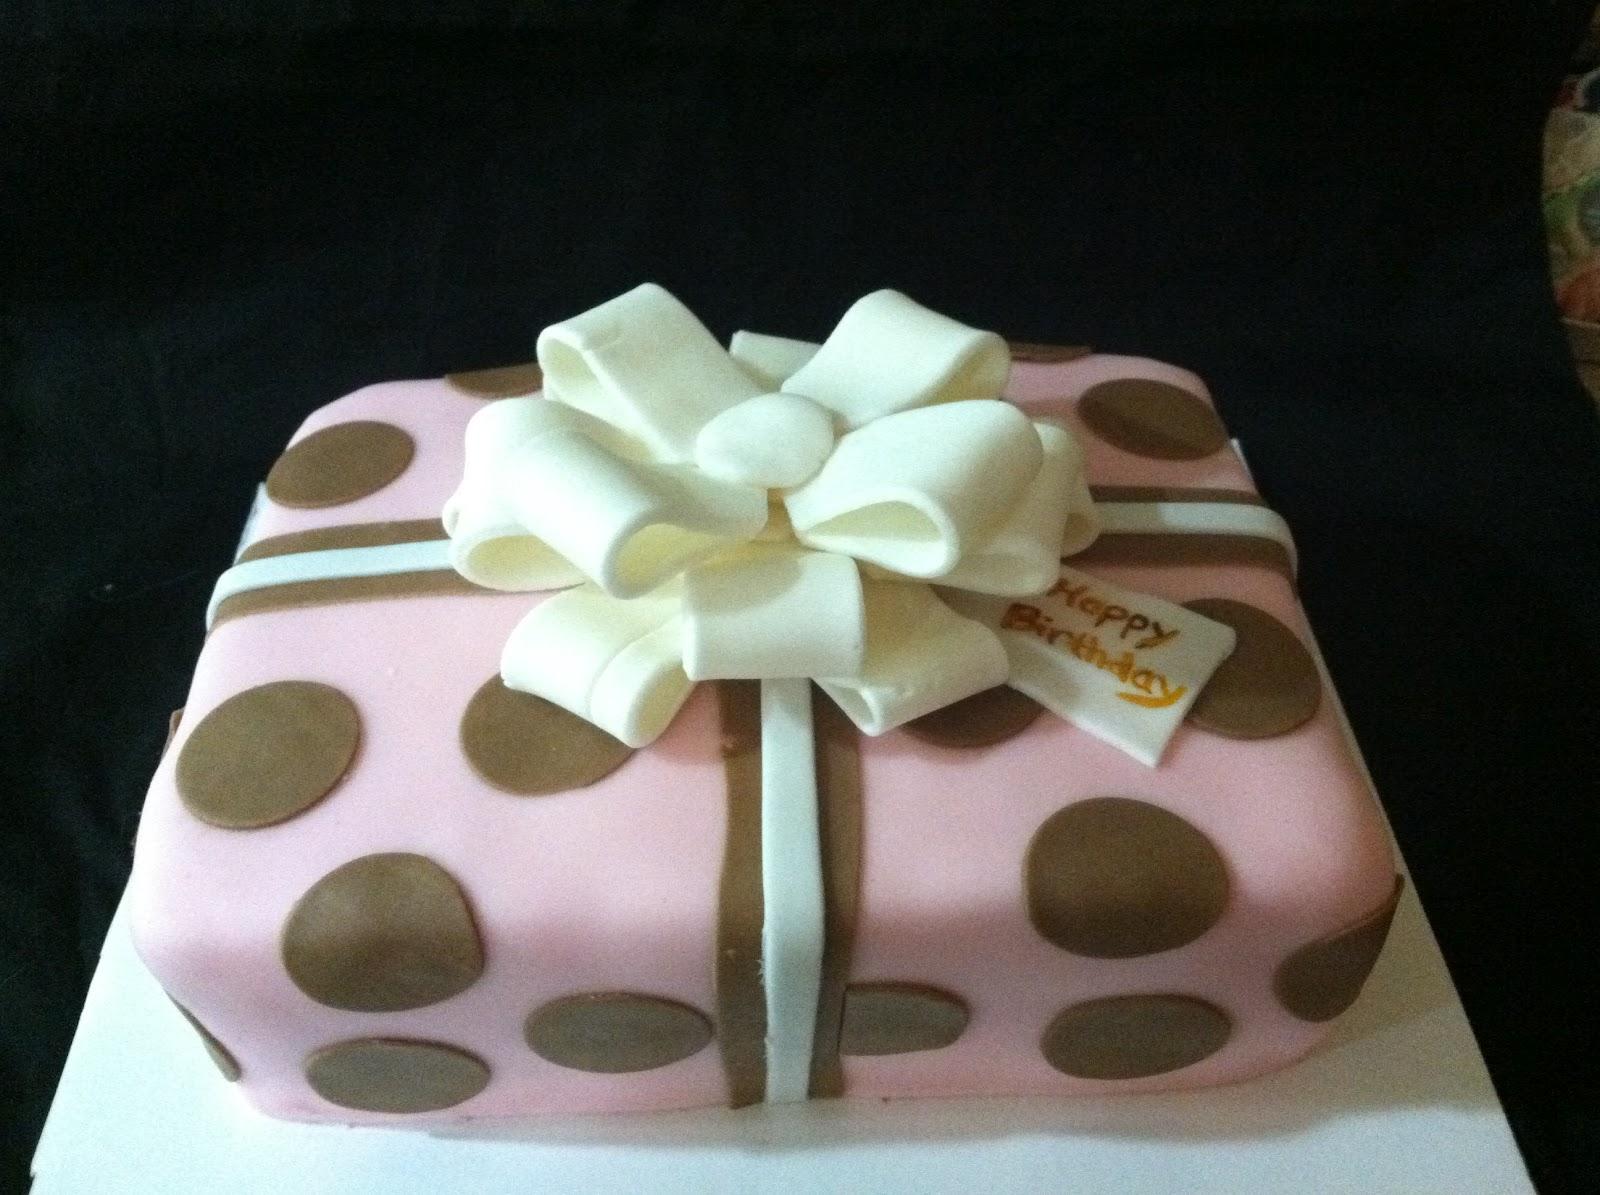 Cake Decorating Gift Box : Cake Decorating for Dummies: Gift Box Cake